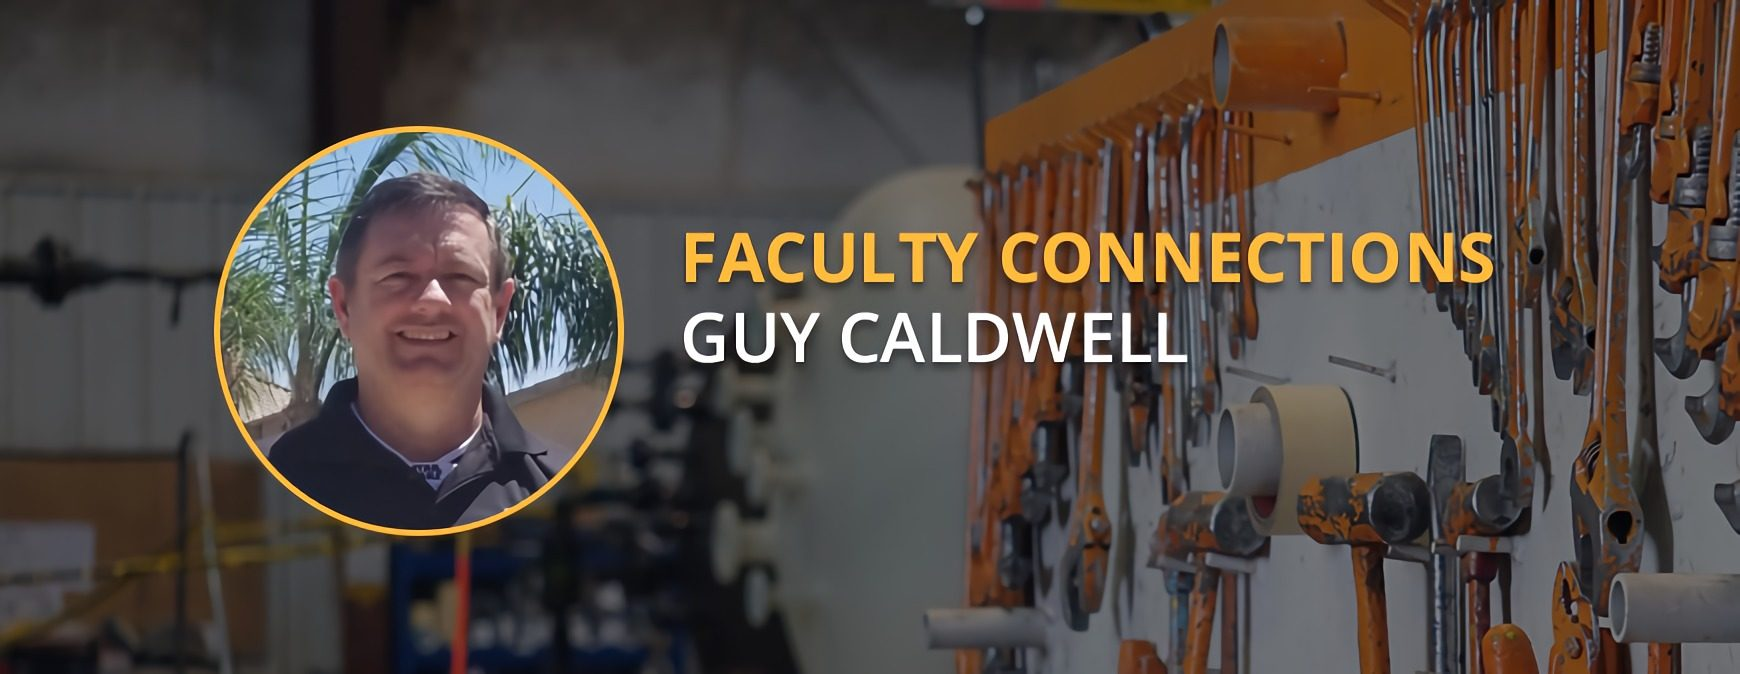 Guy Caldwell